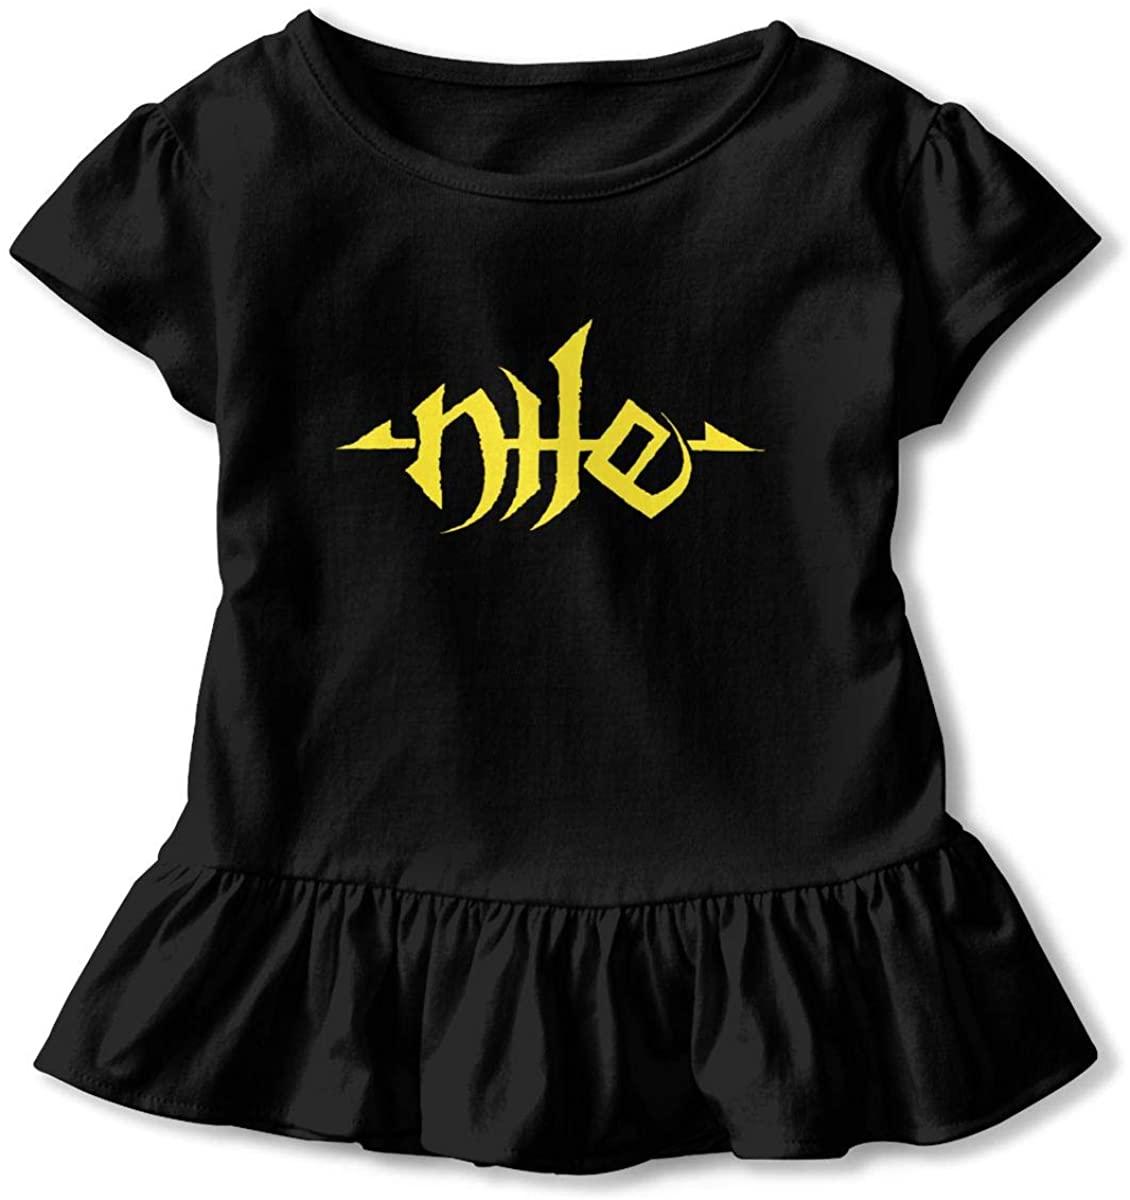 Kids Nile Band Logo Toddler Short Sleeve T Shirt Children Girls Cotton Graphic Tee Soft Dress (2-6T)